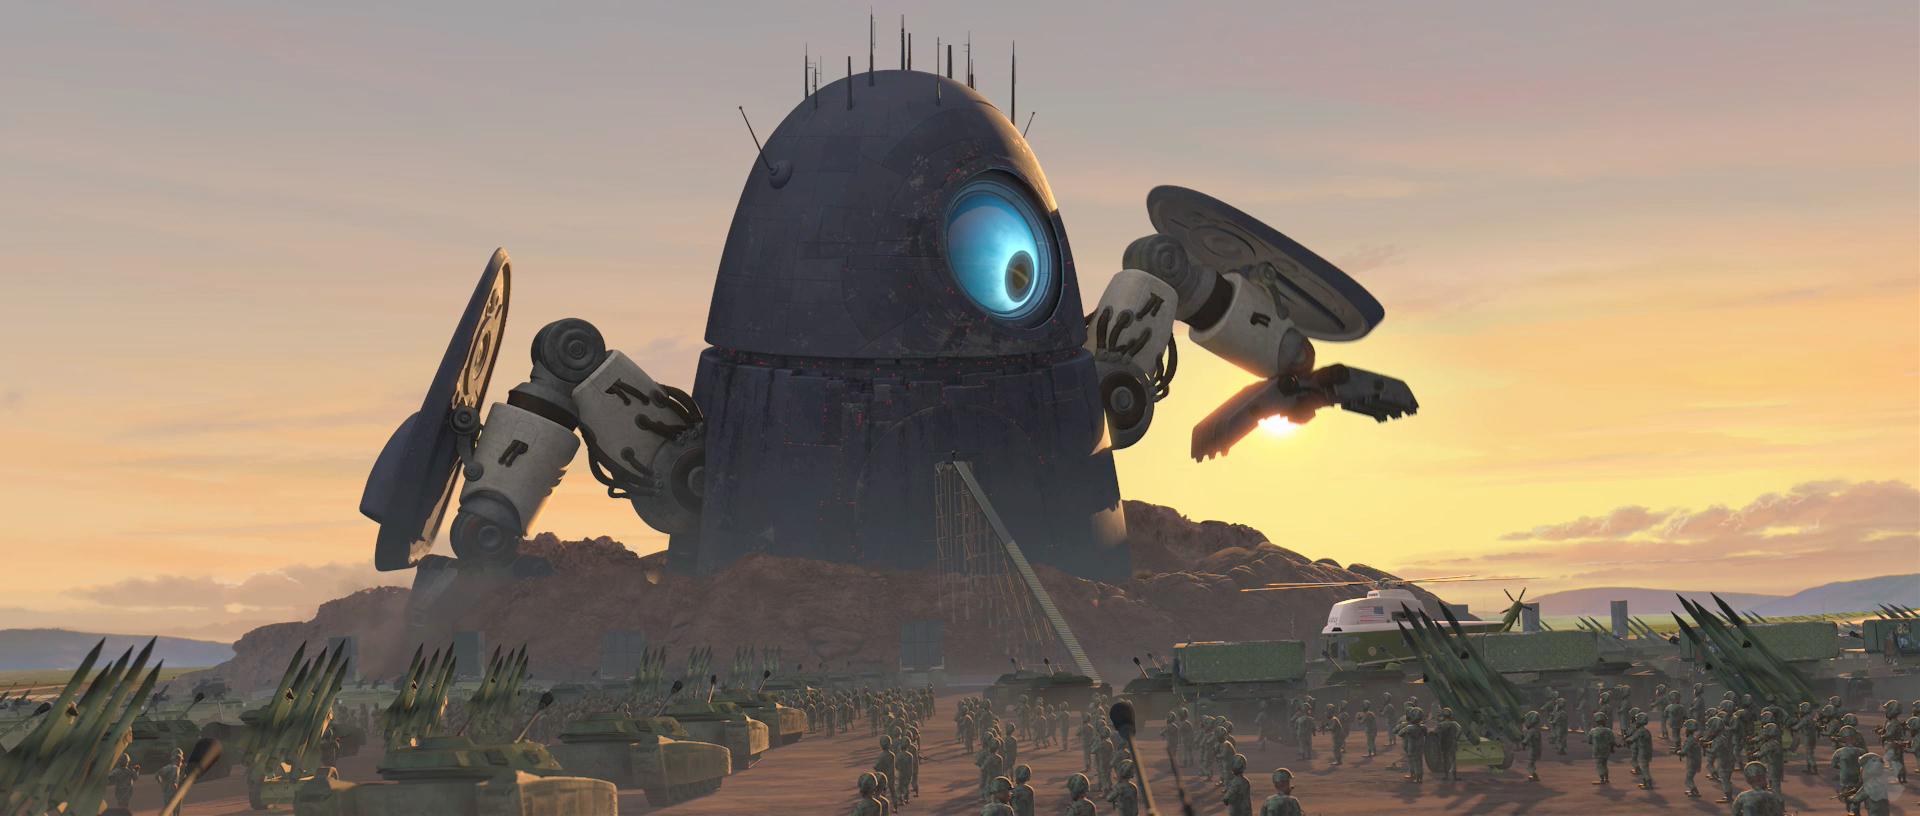 Robot probes | Monsters vs. Aliens Wiki | FANDOM powered by Wikia